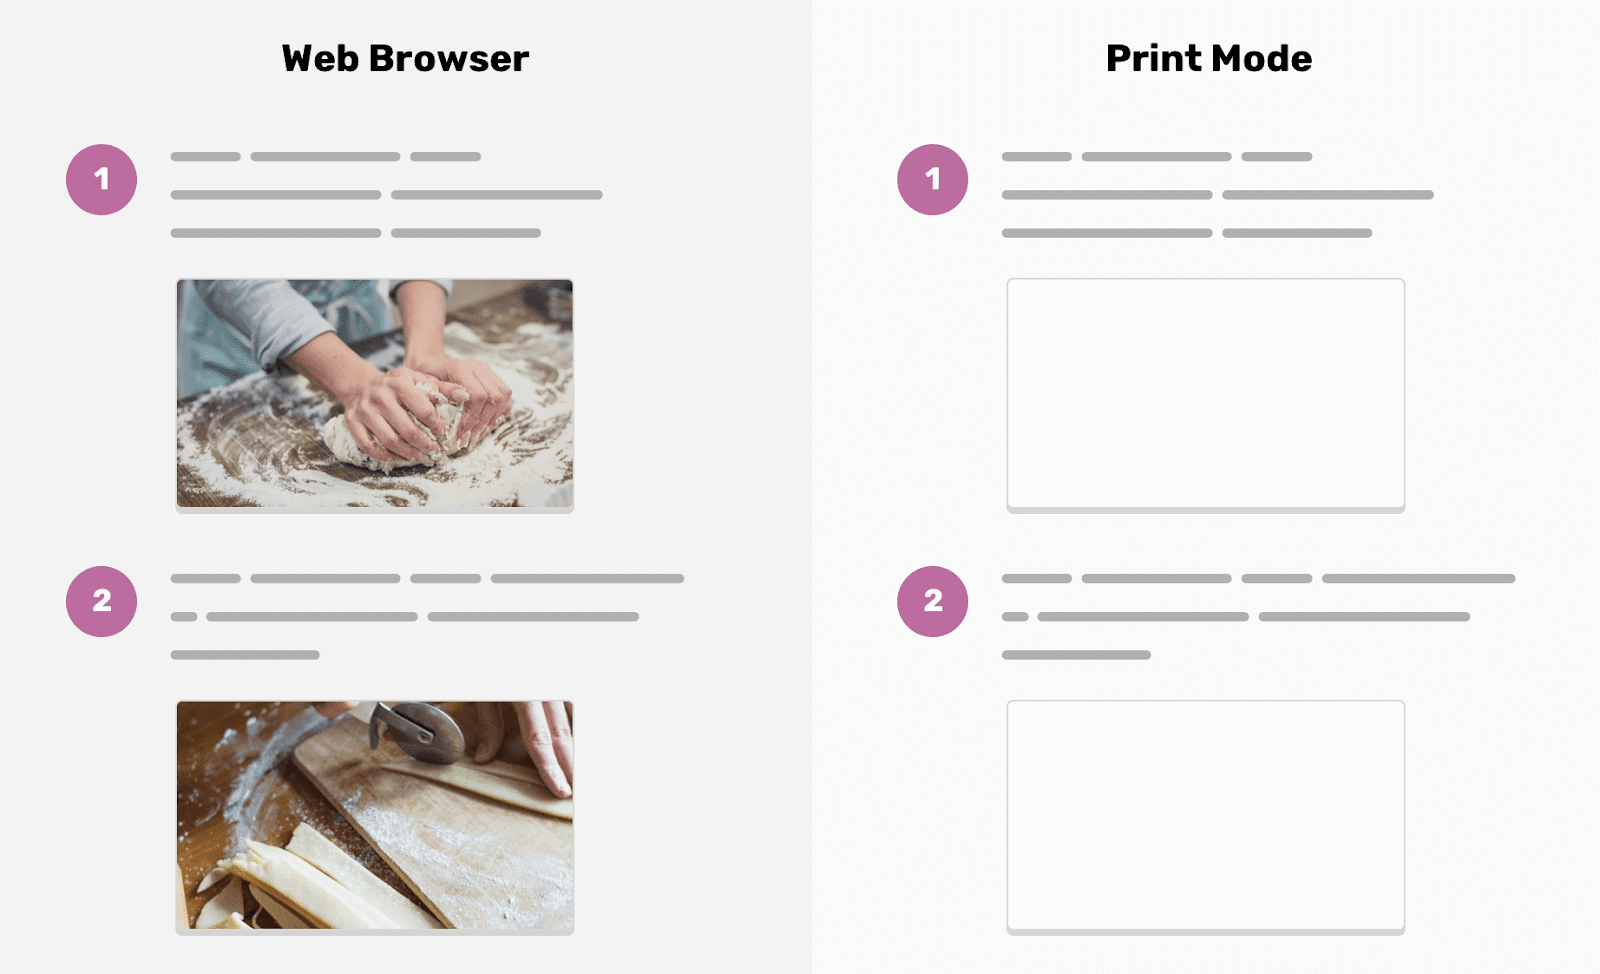 [в закладки] Работа с изображениями в веб - 23